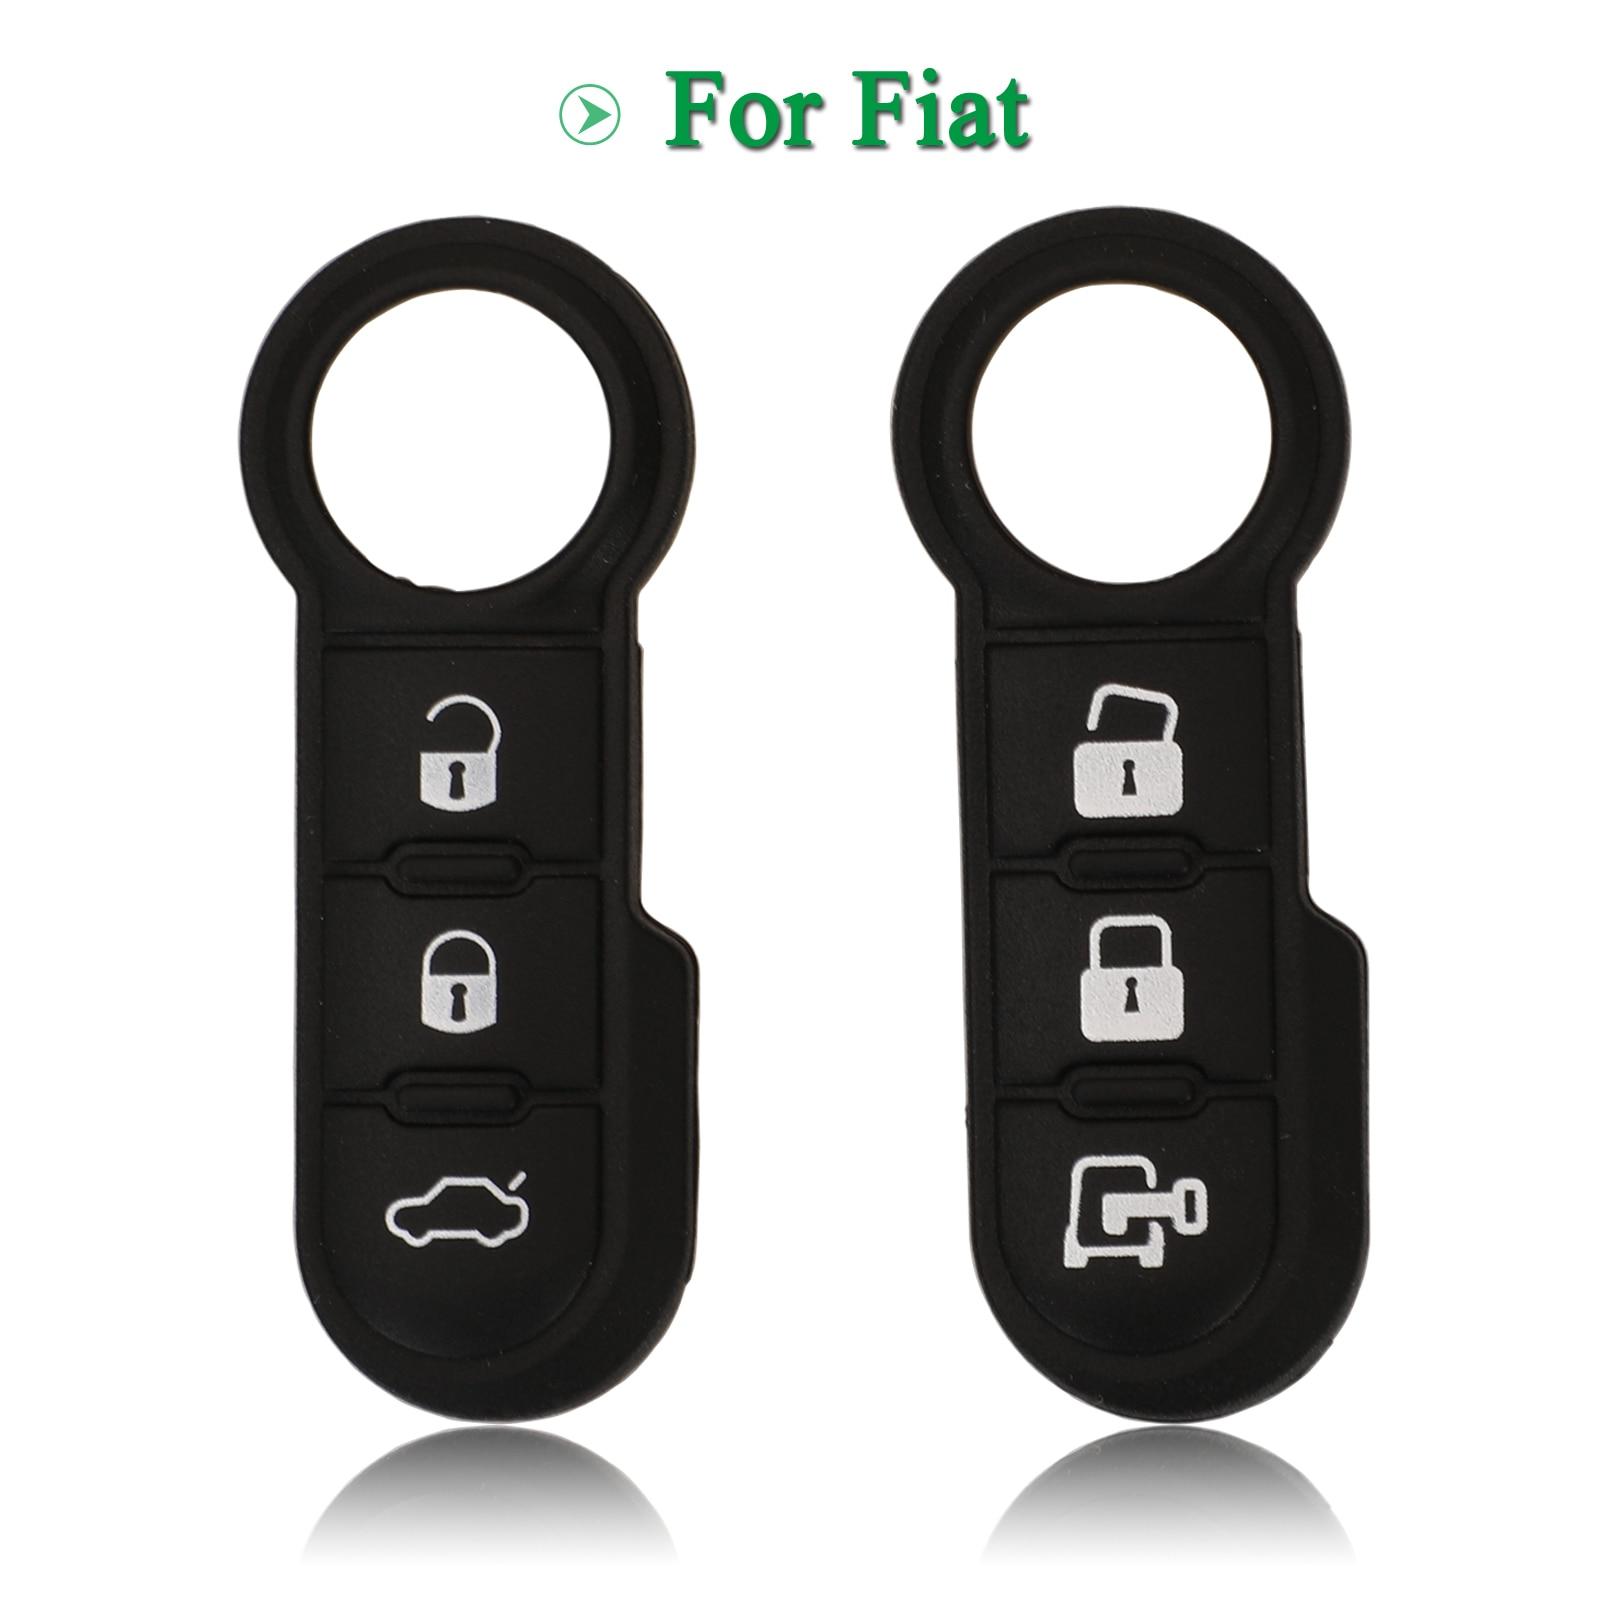 Bilchave-3 botones para Fiat 500 Panda Abarth Punto funda para mando a...